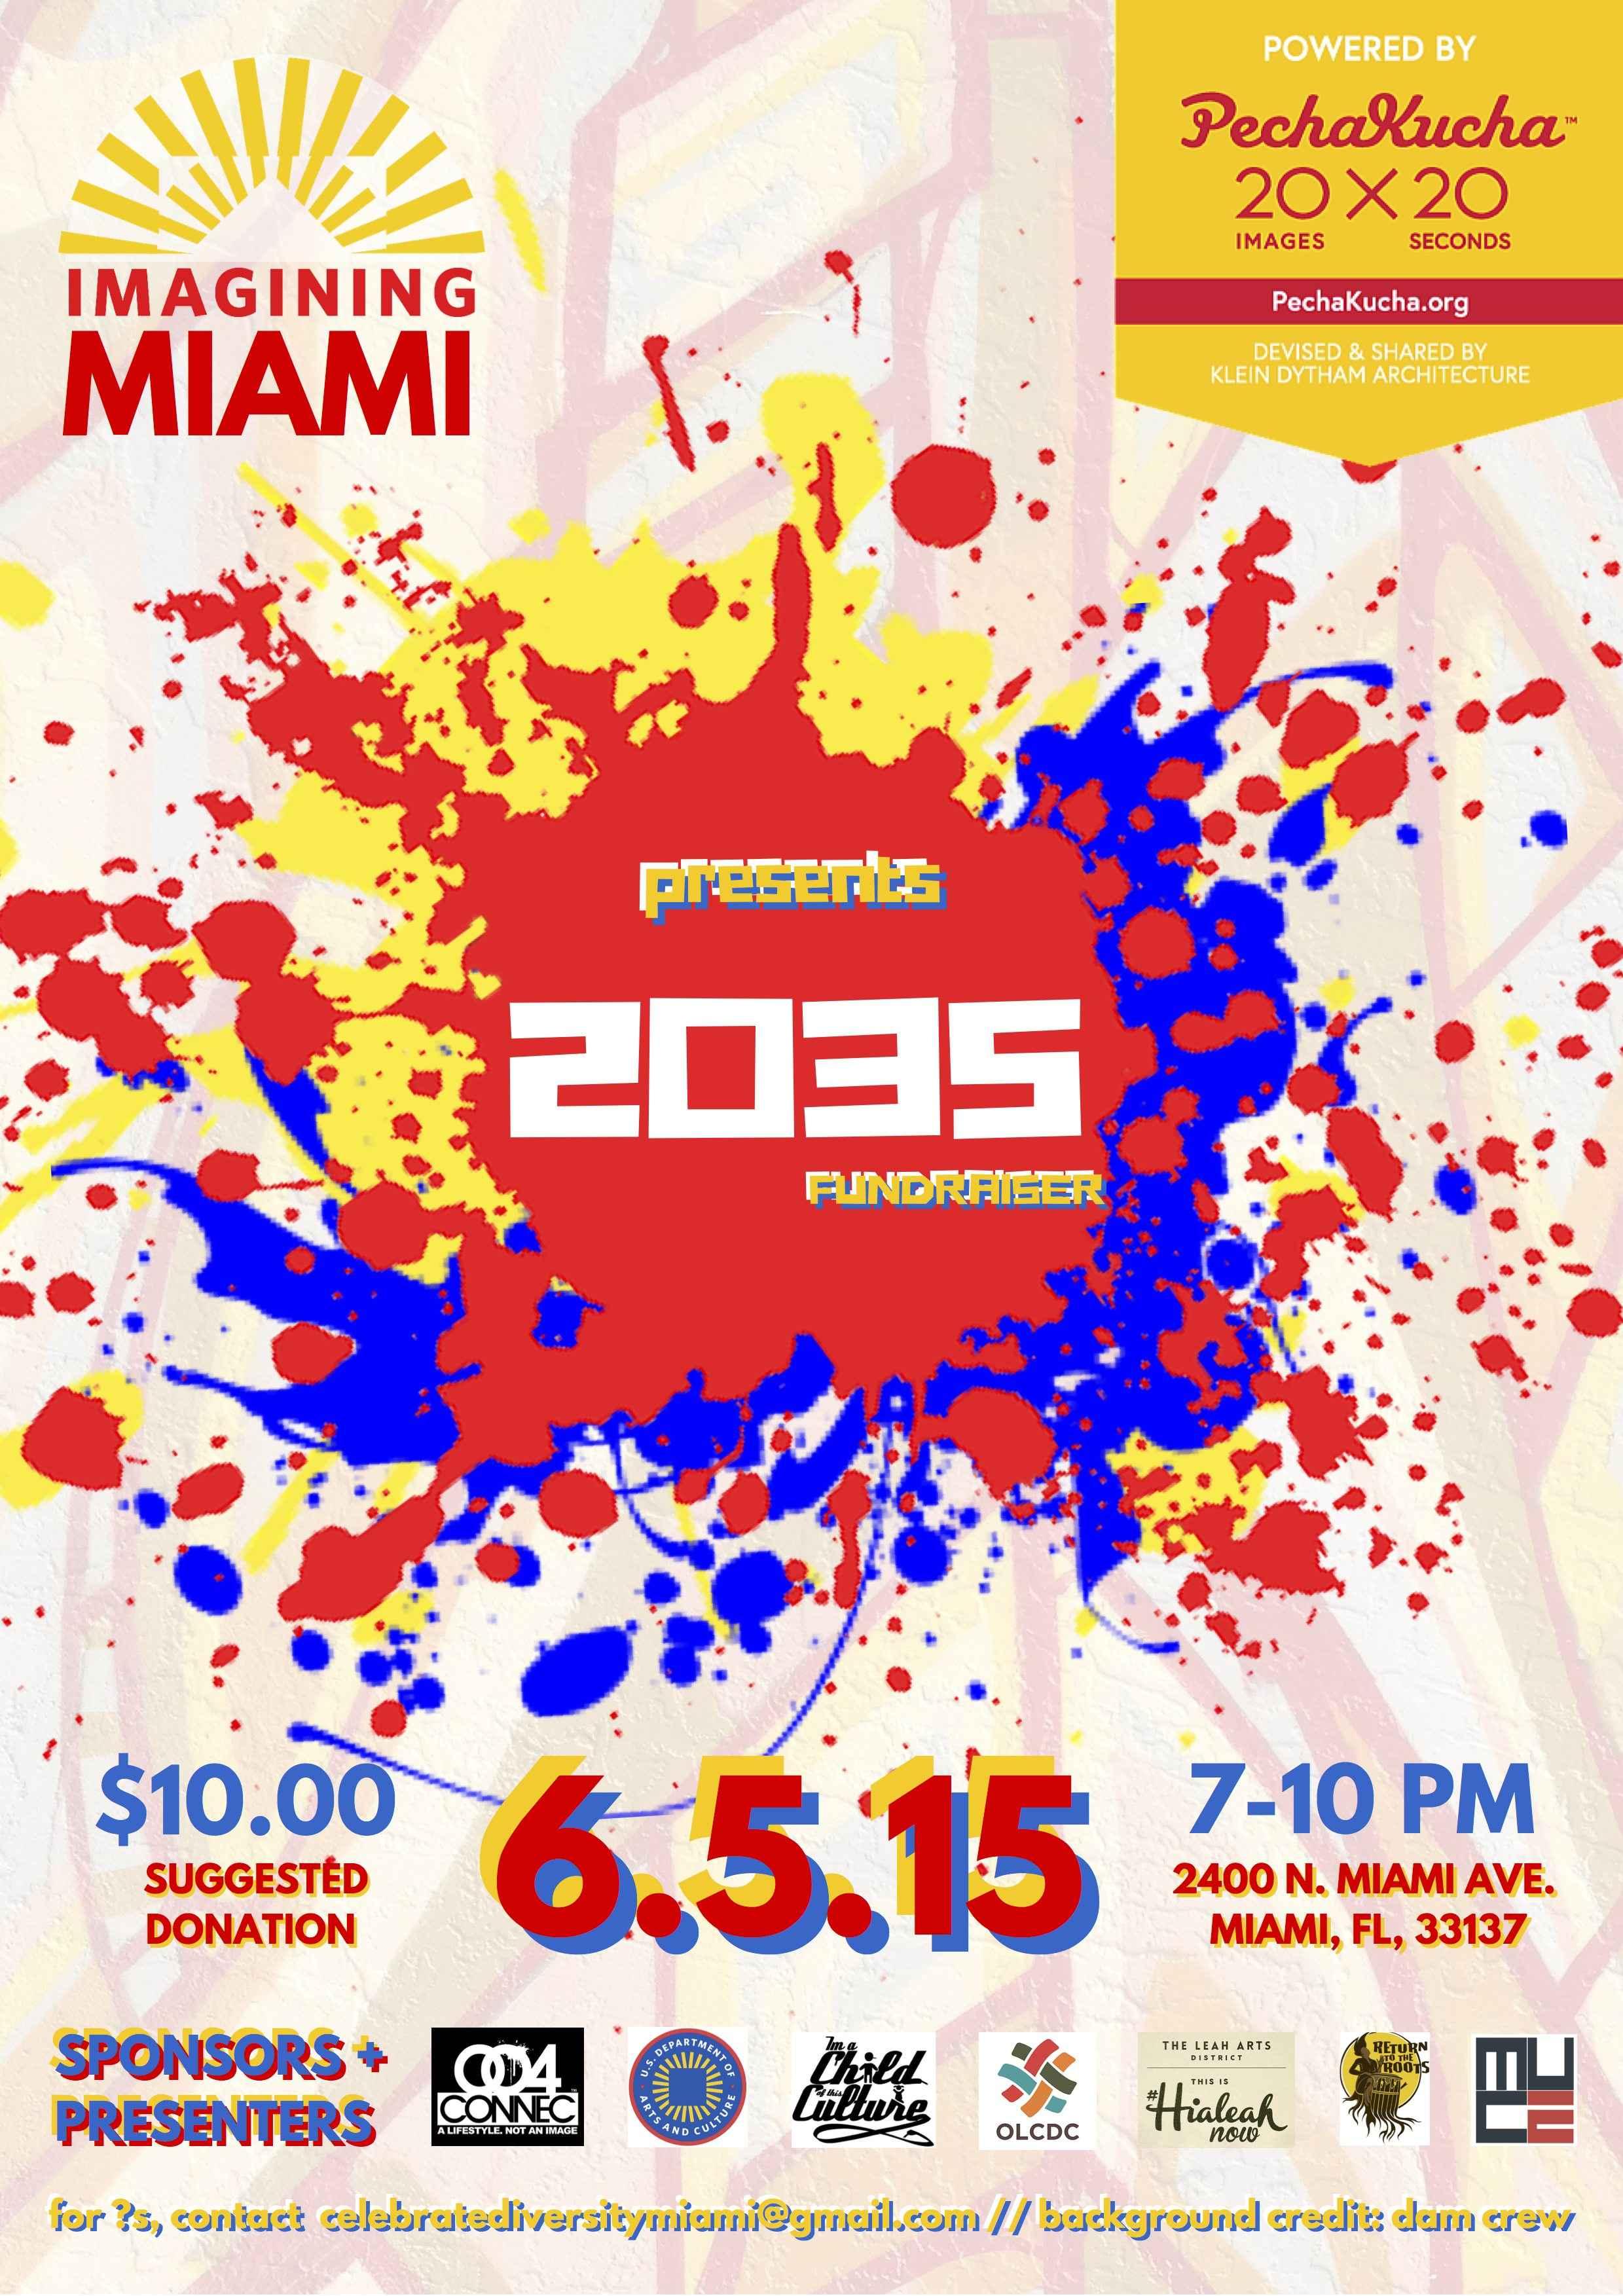 Imagining Miami 2035 PPK Fundraiser